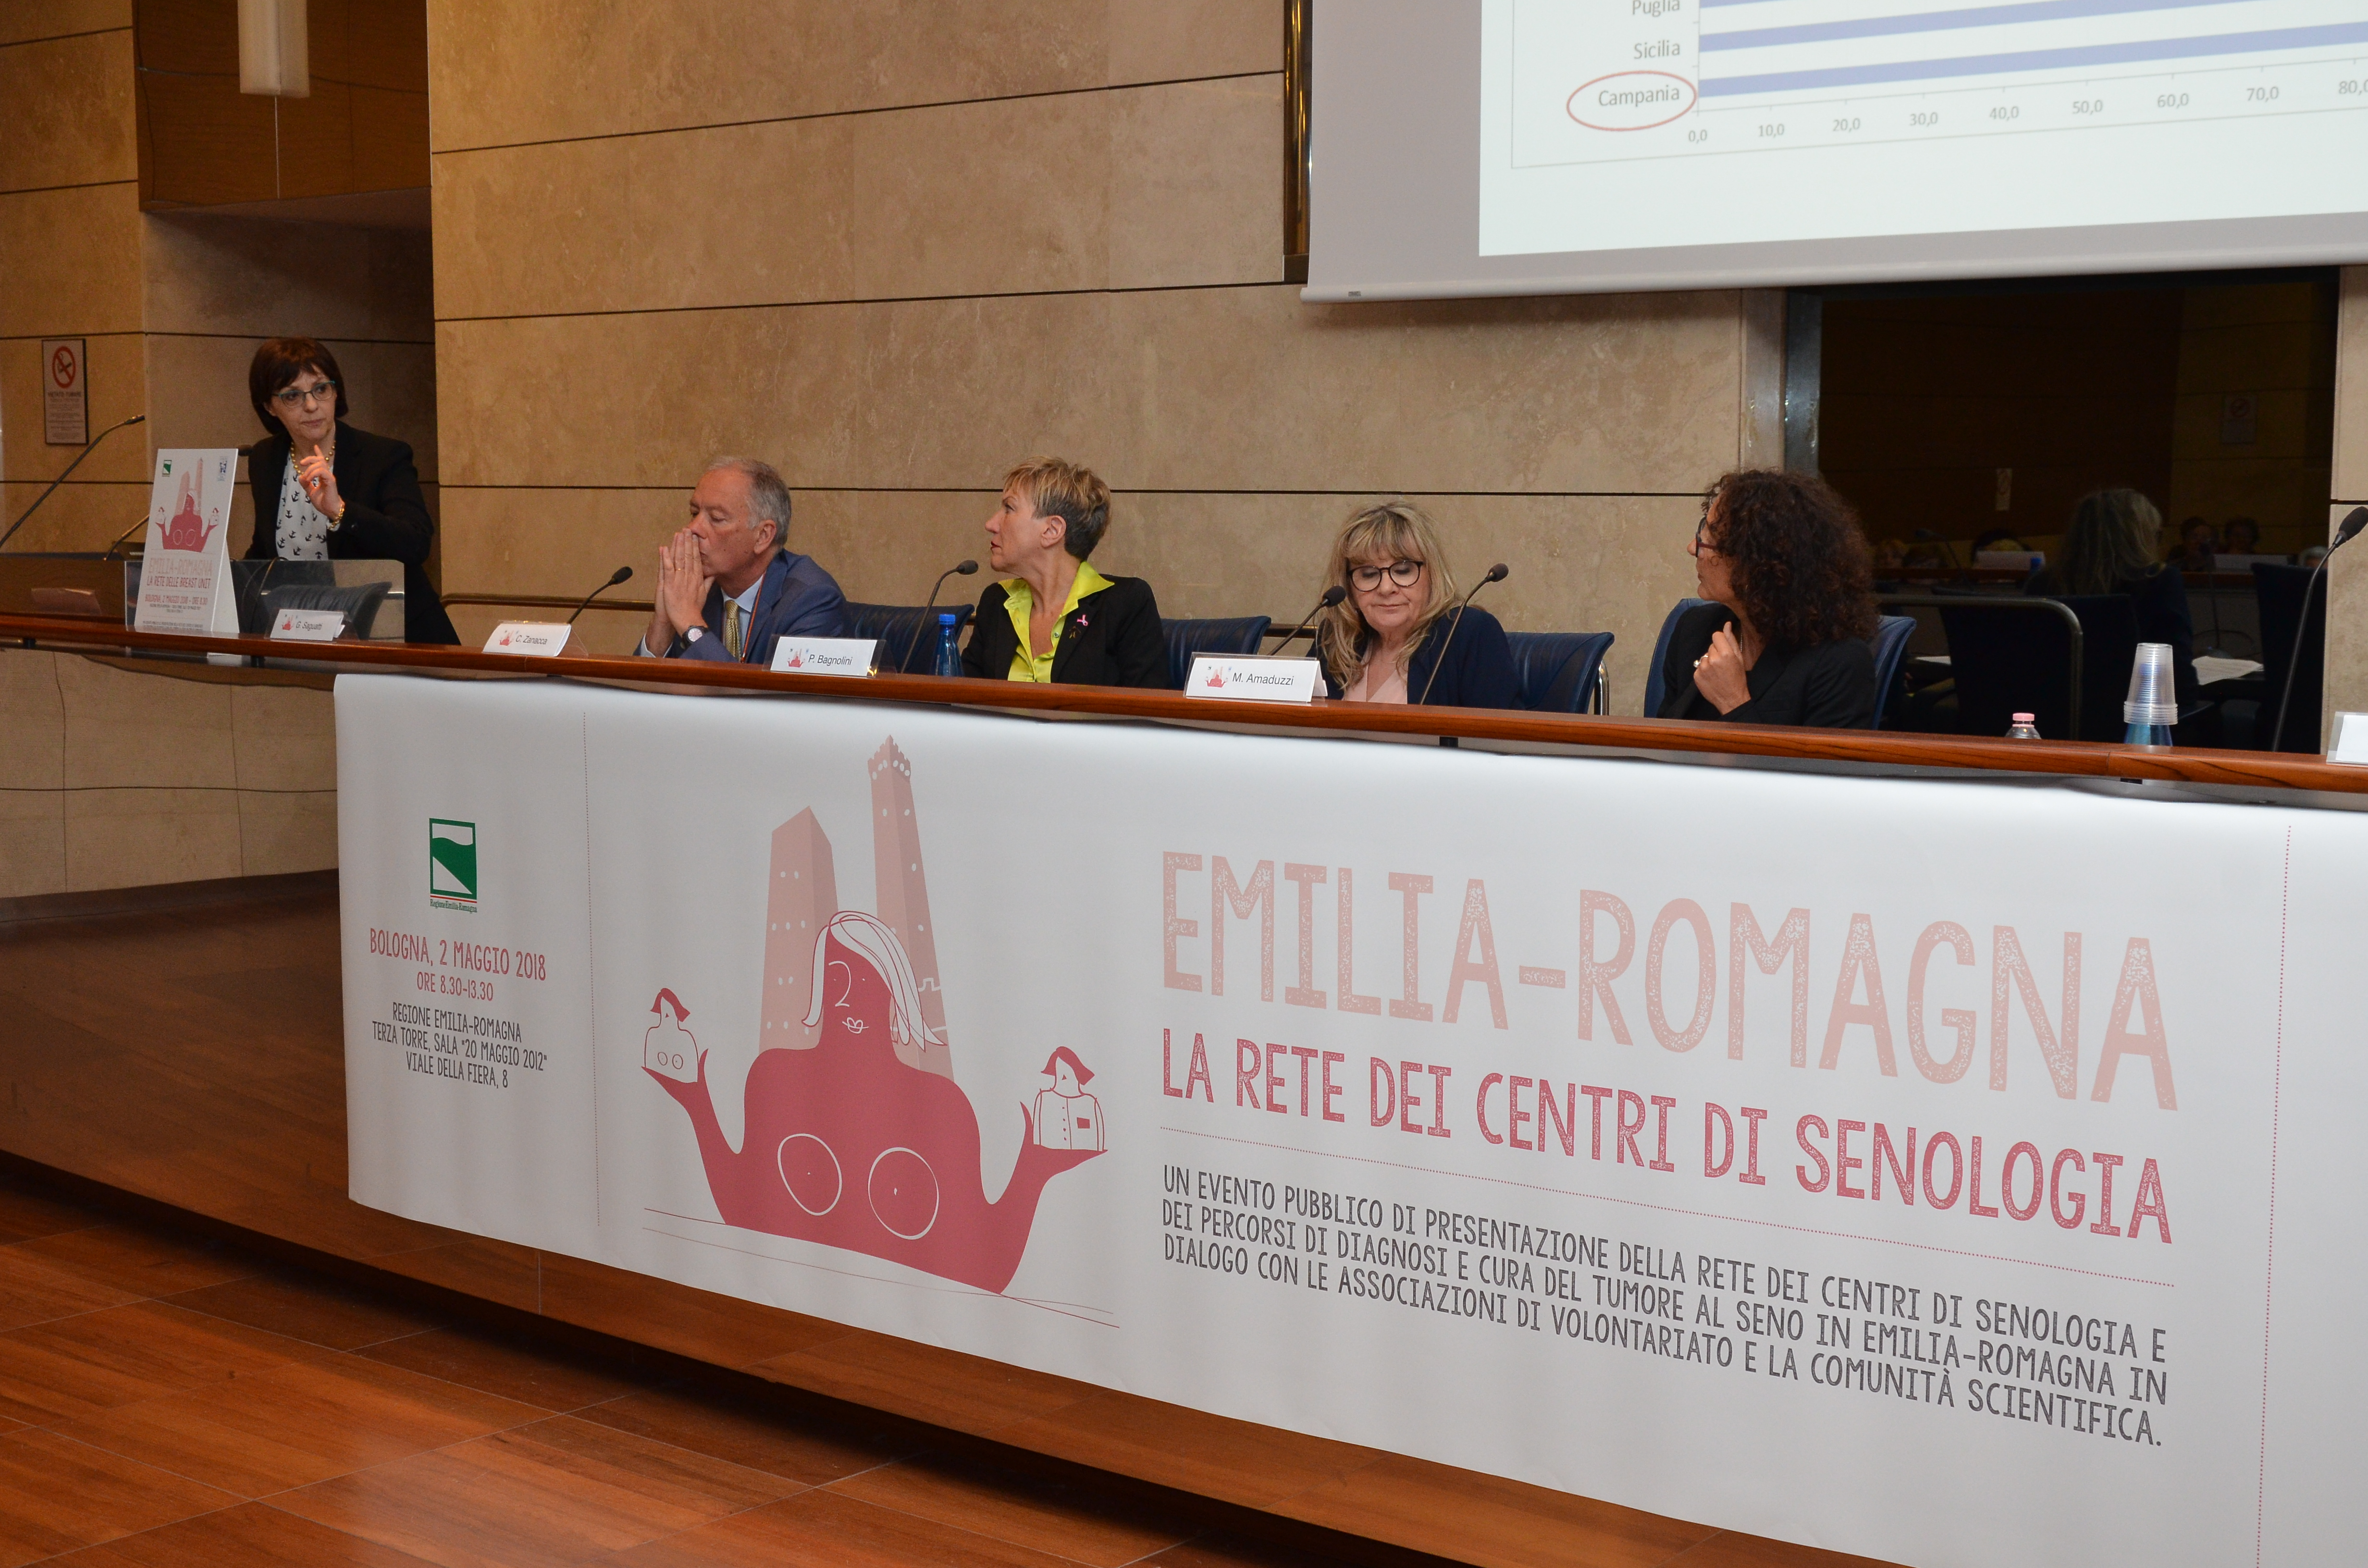 europa-donna-italia-tumore-al-seno-emilia-romagna-associazioni-tavola rotonda